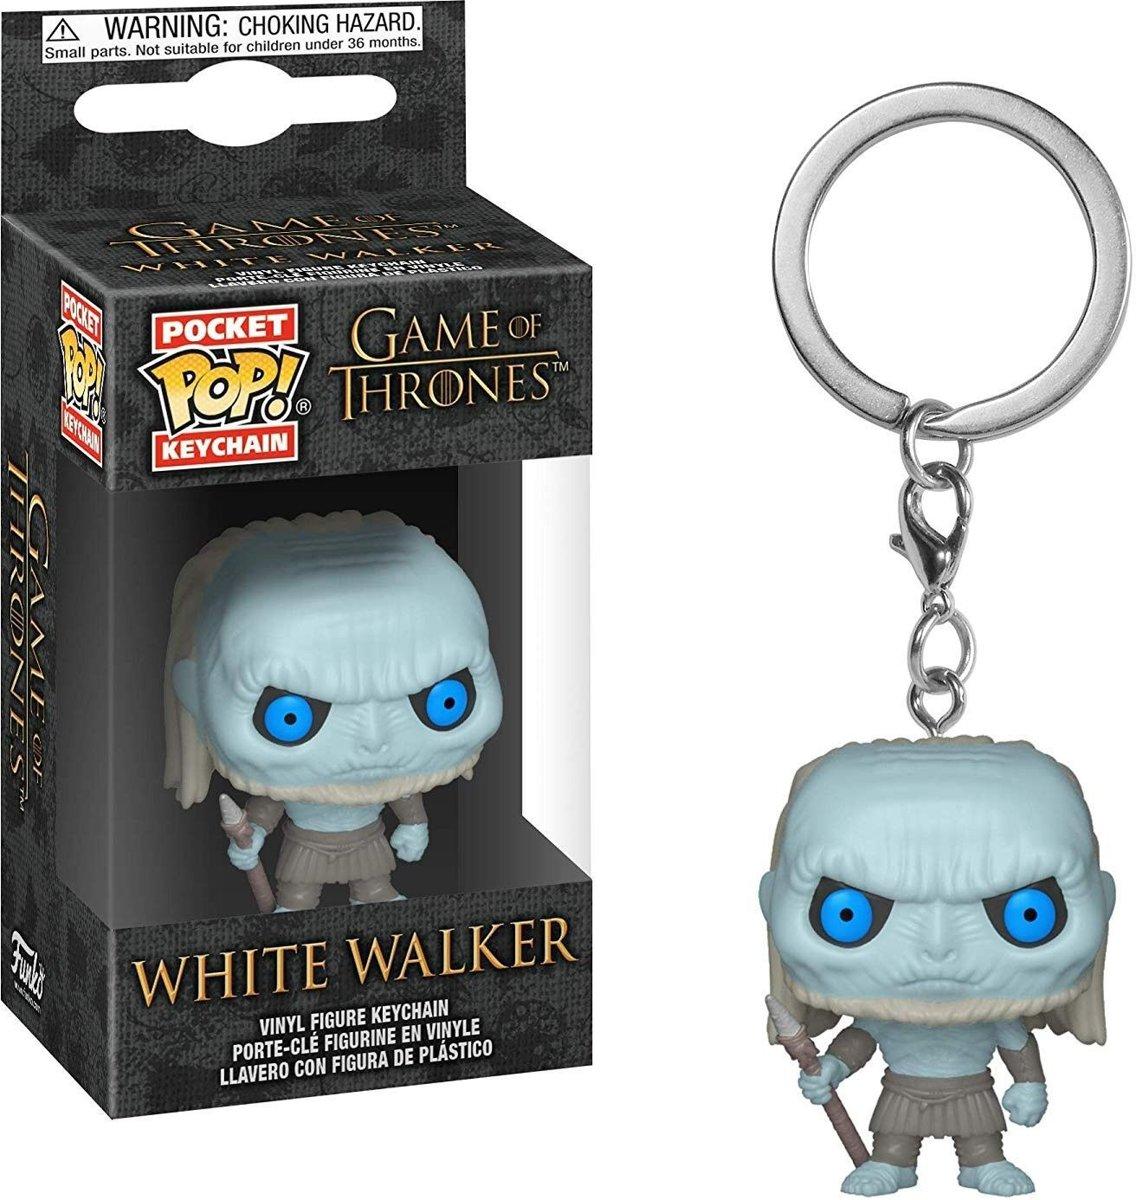 Pop! Keychain: Game of Thrones - White Walker FUNKO kopen